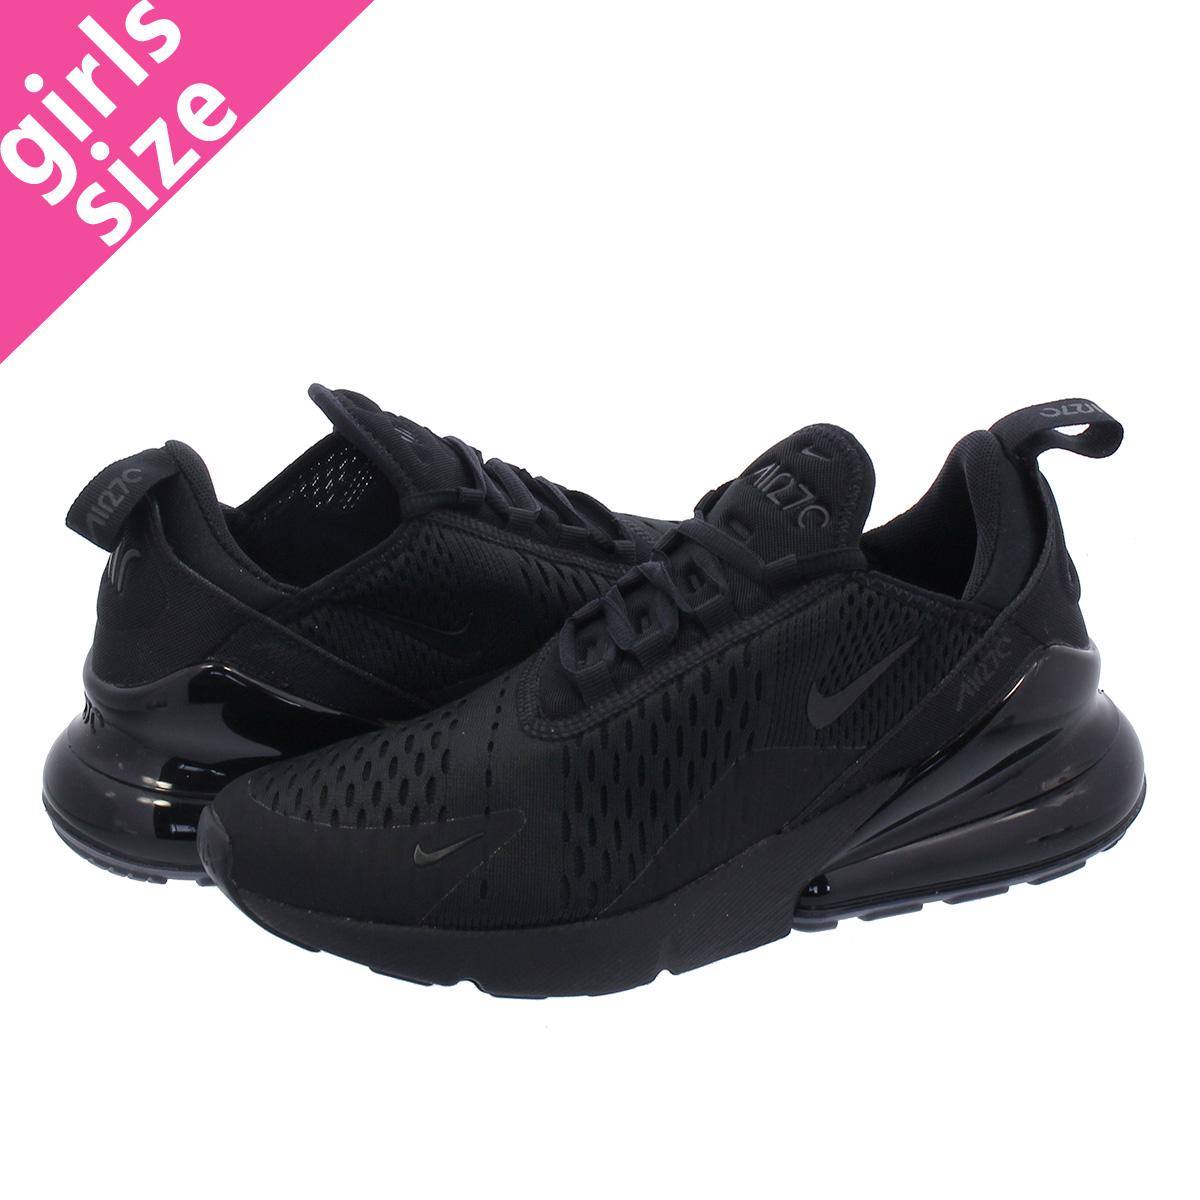 new concept c0287 4940c NIKE WMNS AIR MAX 270 Nike women Air Max 270 BLACK/BLACK/BLACK ah6789-006-l